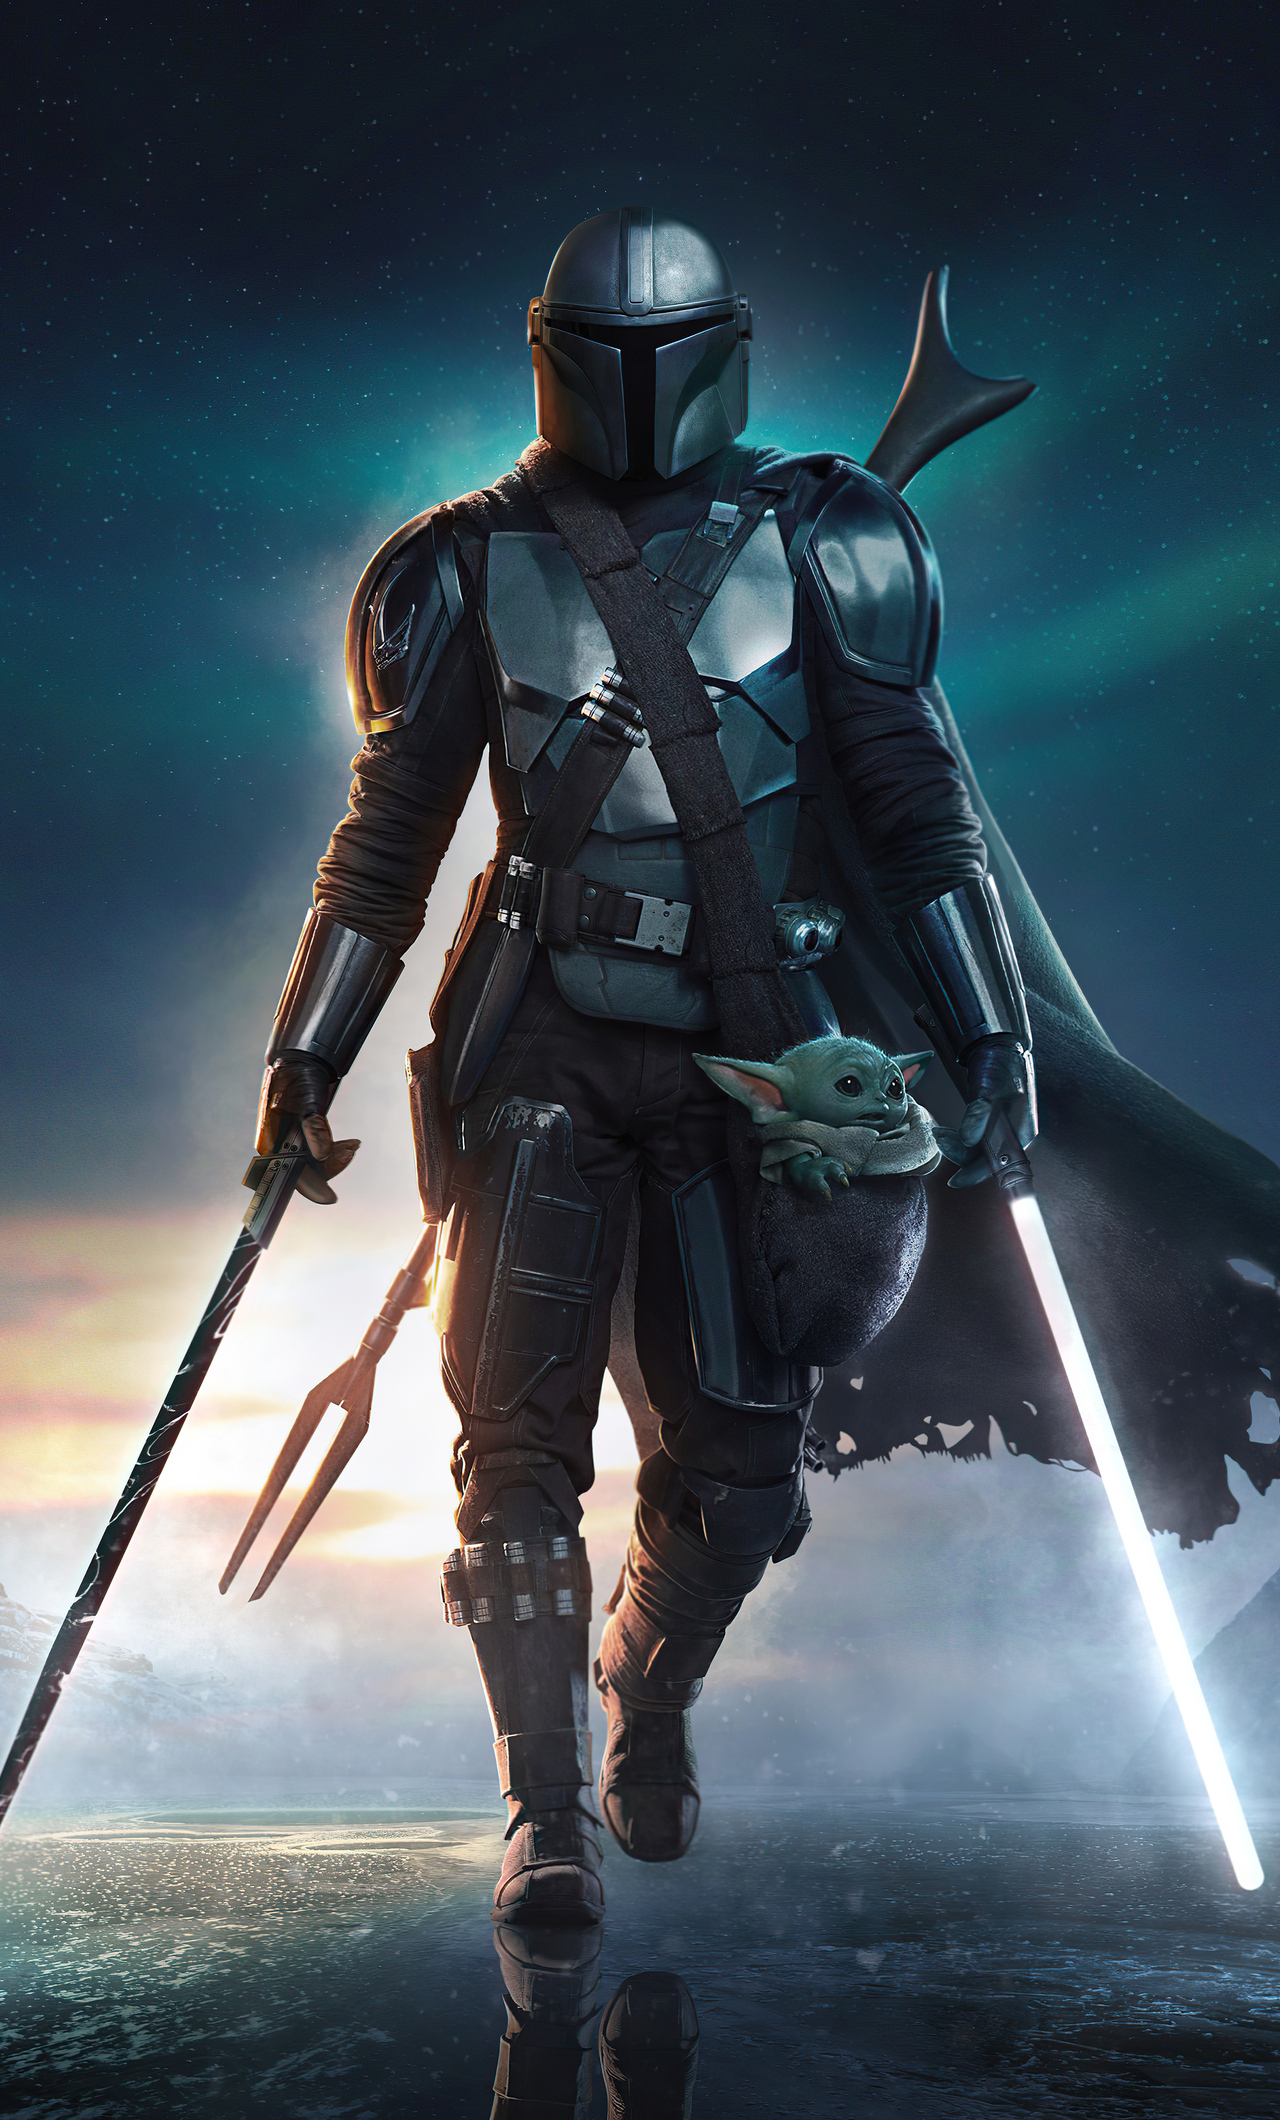 the-mandalorian-light-and-dark-sabers-4k-pd.jpg